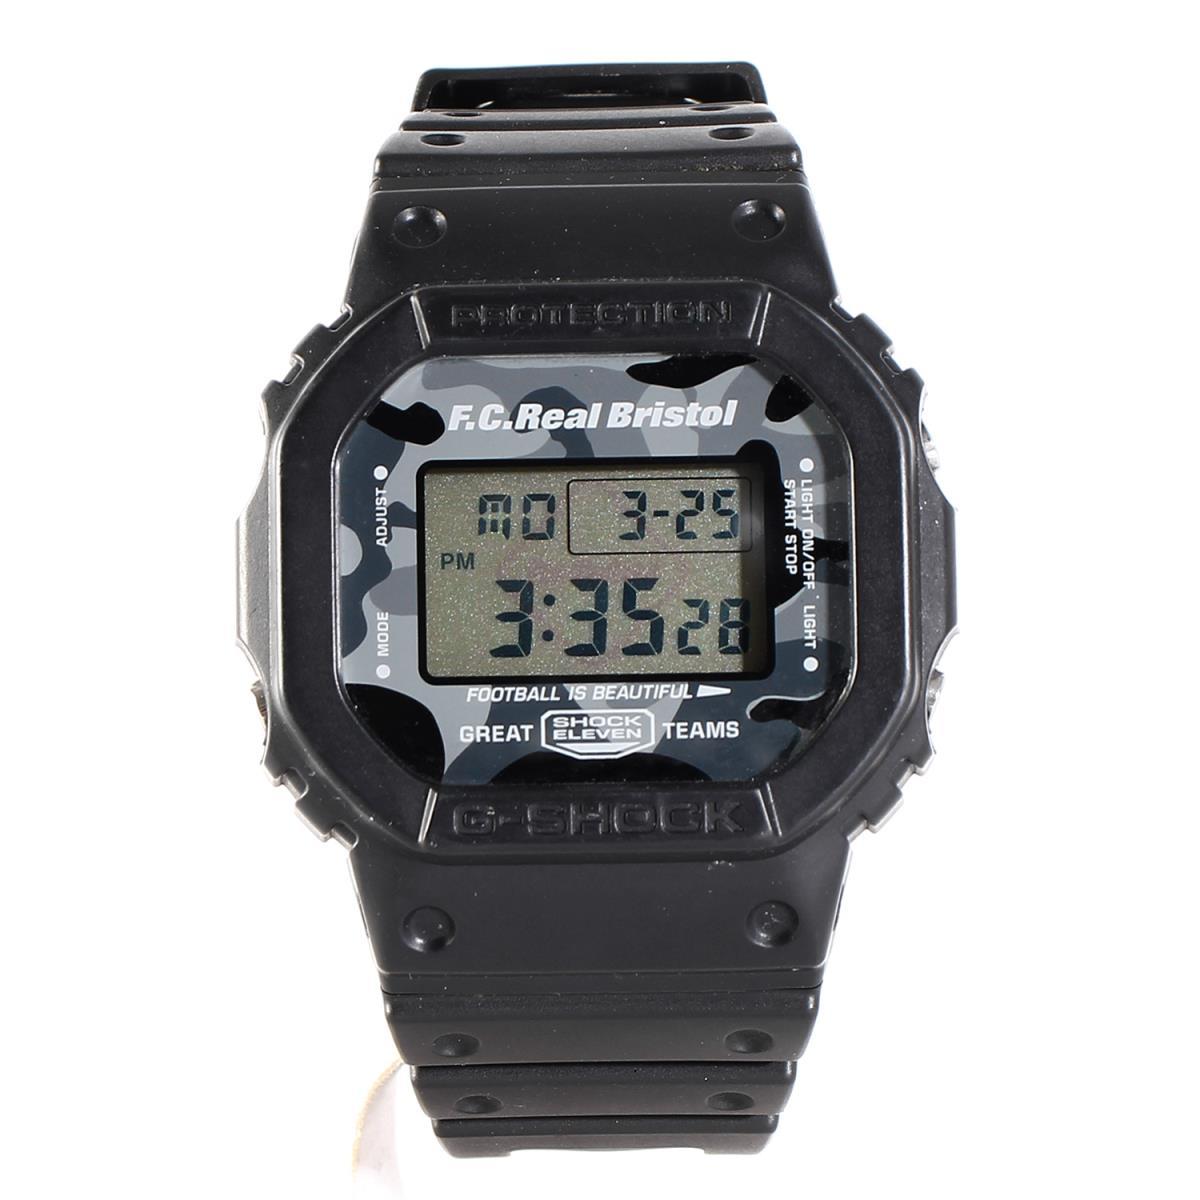 FCRB (エフシーアールビー) ×CASIO G-SHOCK DW-5600(FCRB BLACK CAMOUFLAGE) 腕時計 ブラック×ブラック迷彩 【メンズ】【K2232】【中古】【あす楽☆対応可】